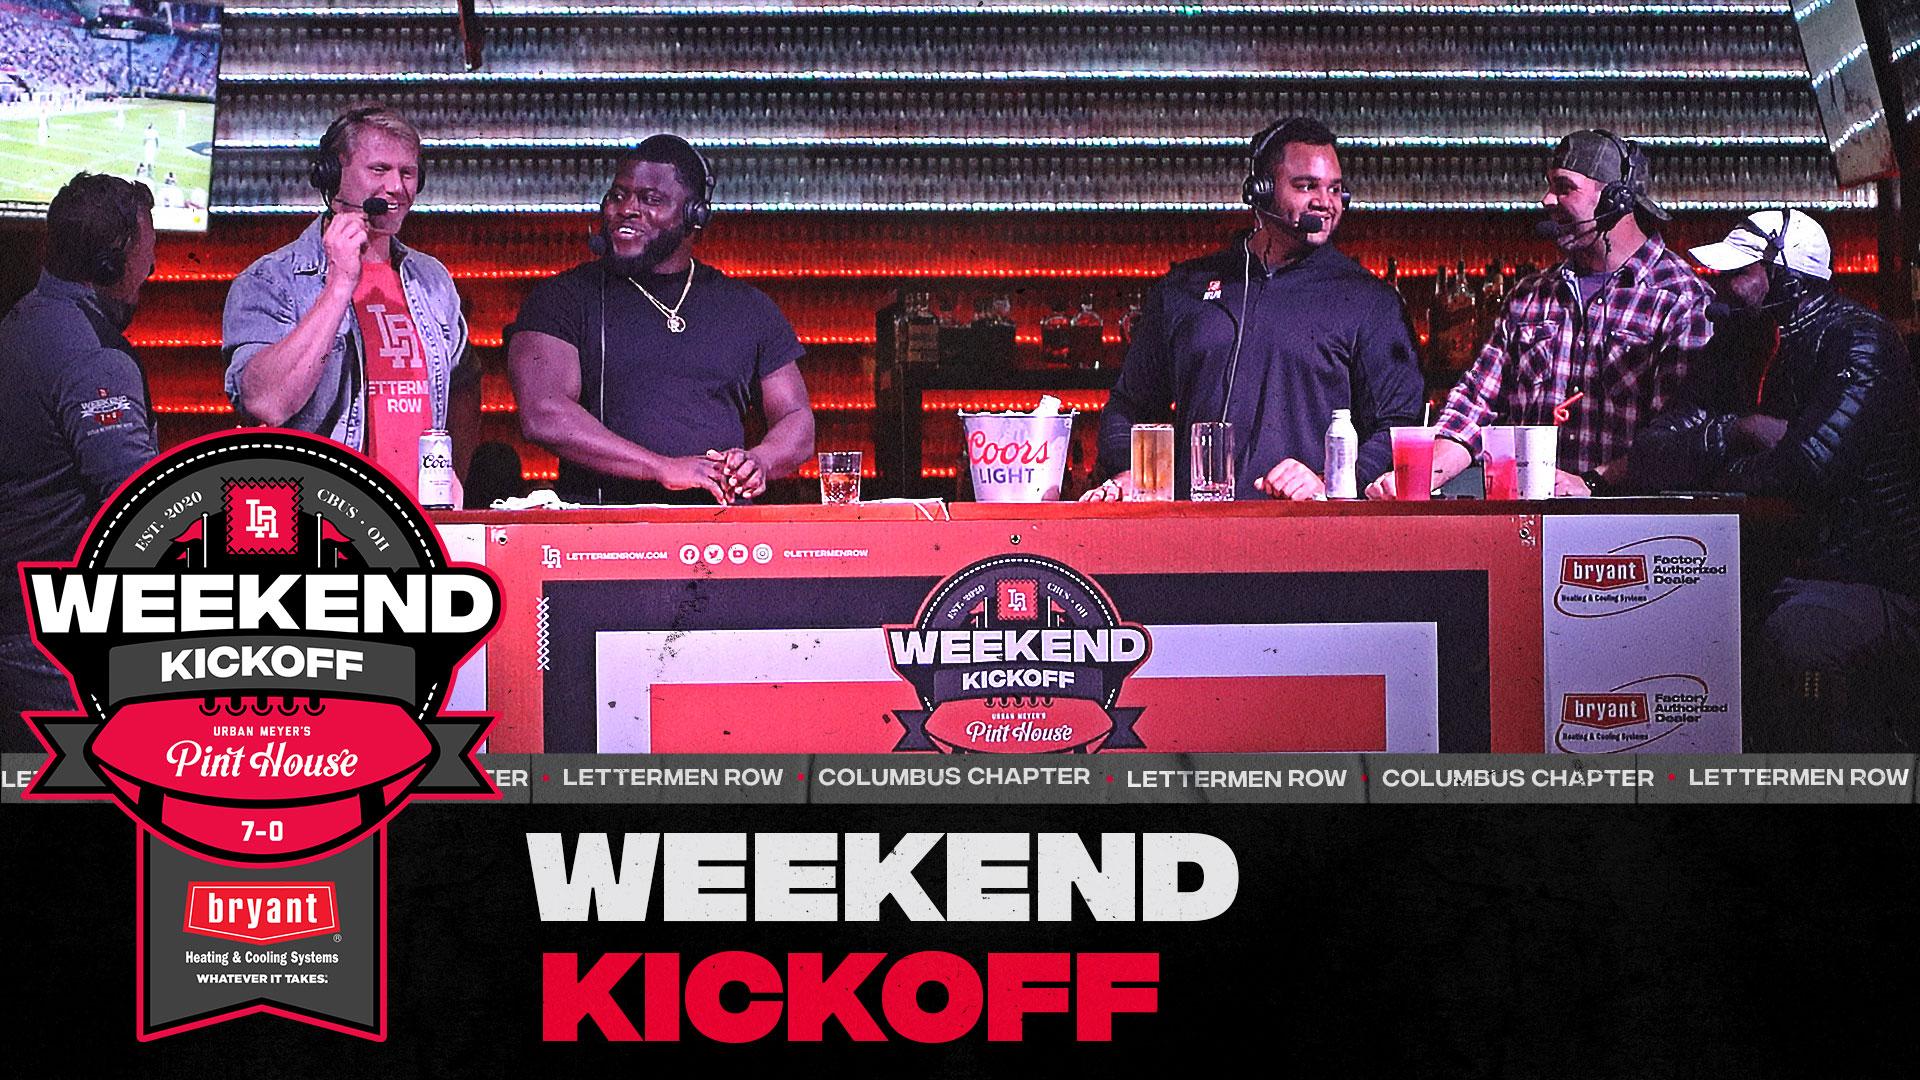 Weekend-Kickoff-nov-12-featured